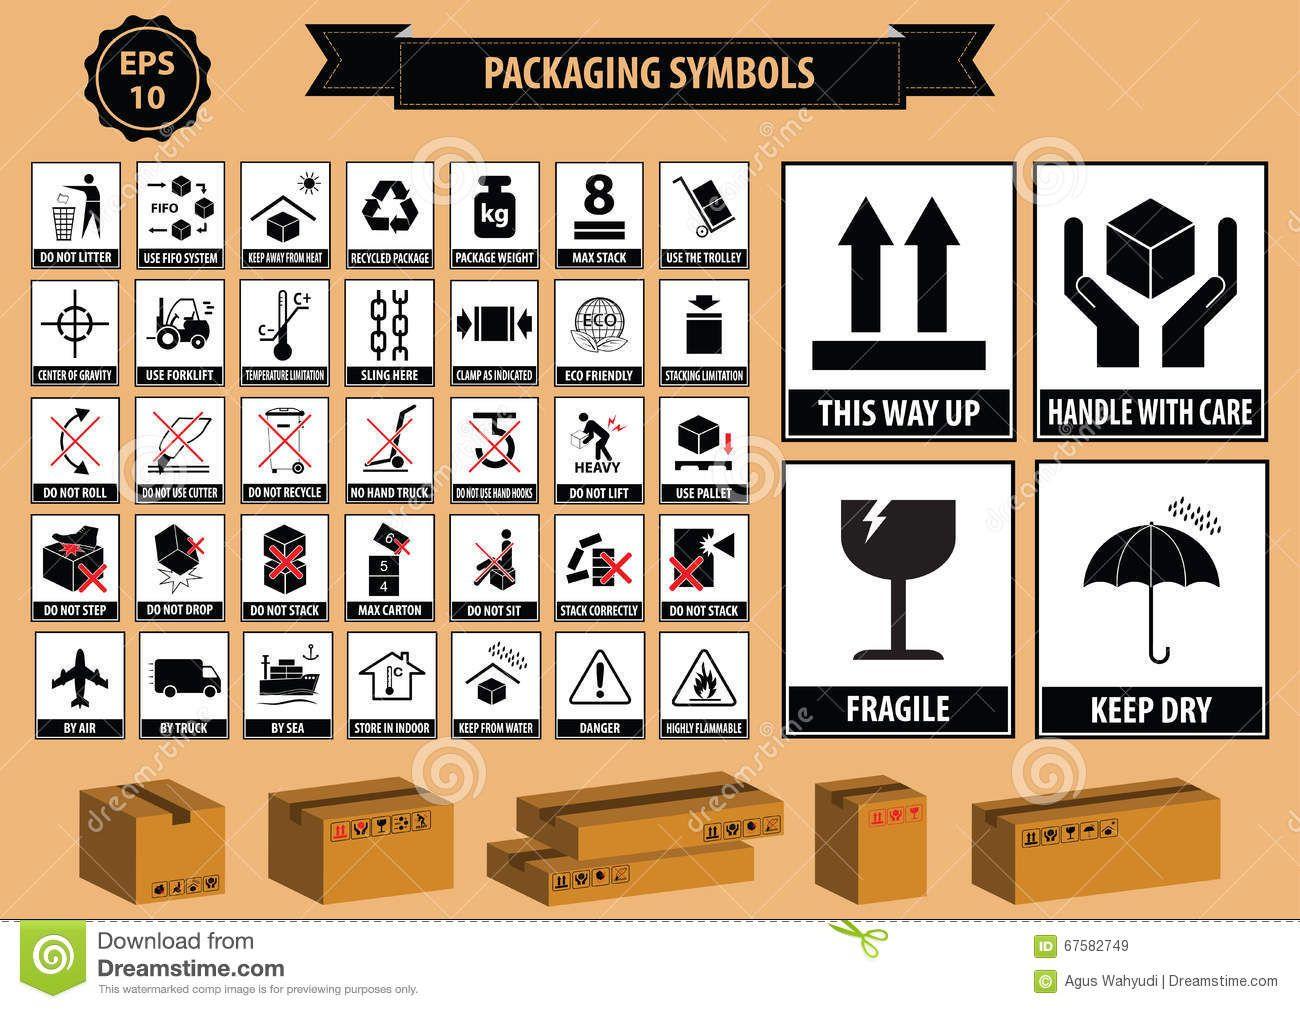 setpackagingsymbolssideuphandlecarefragilekeepdry